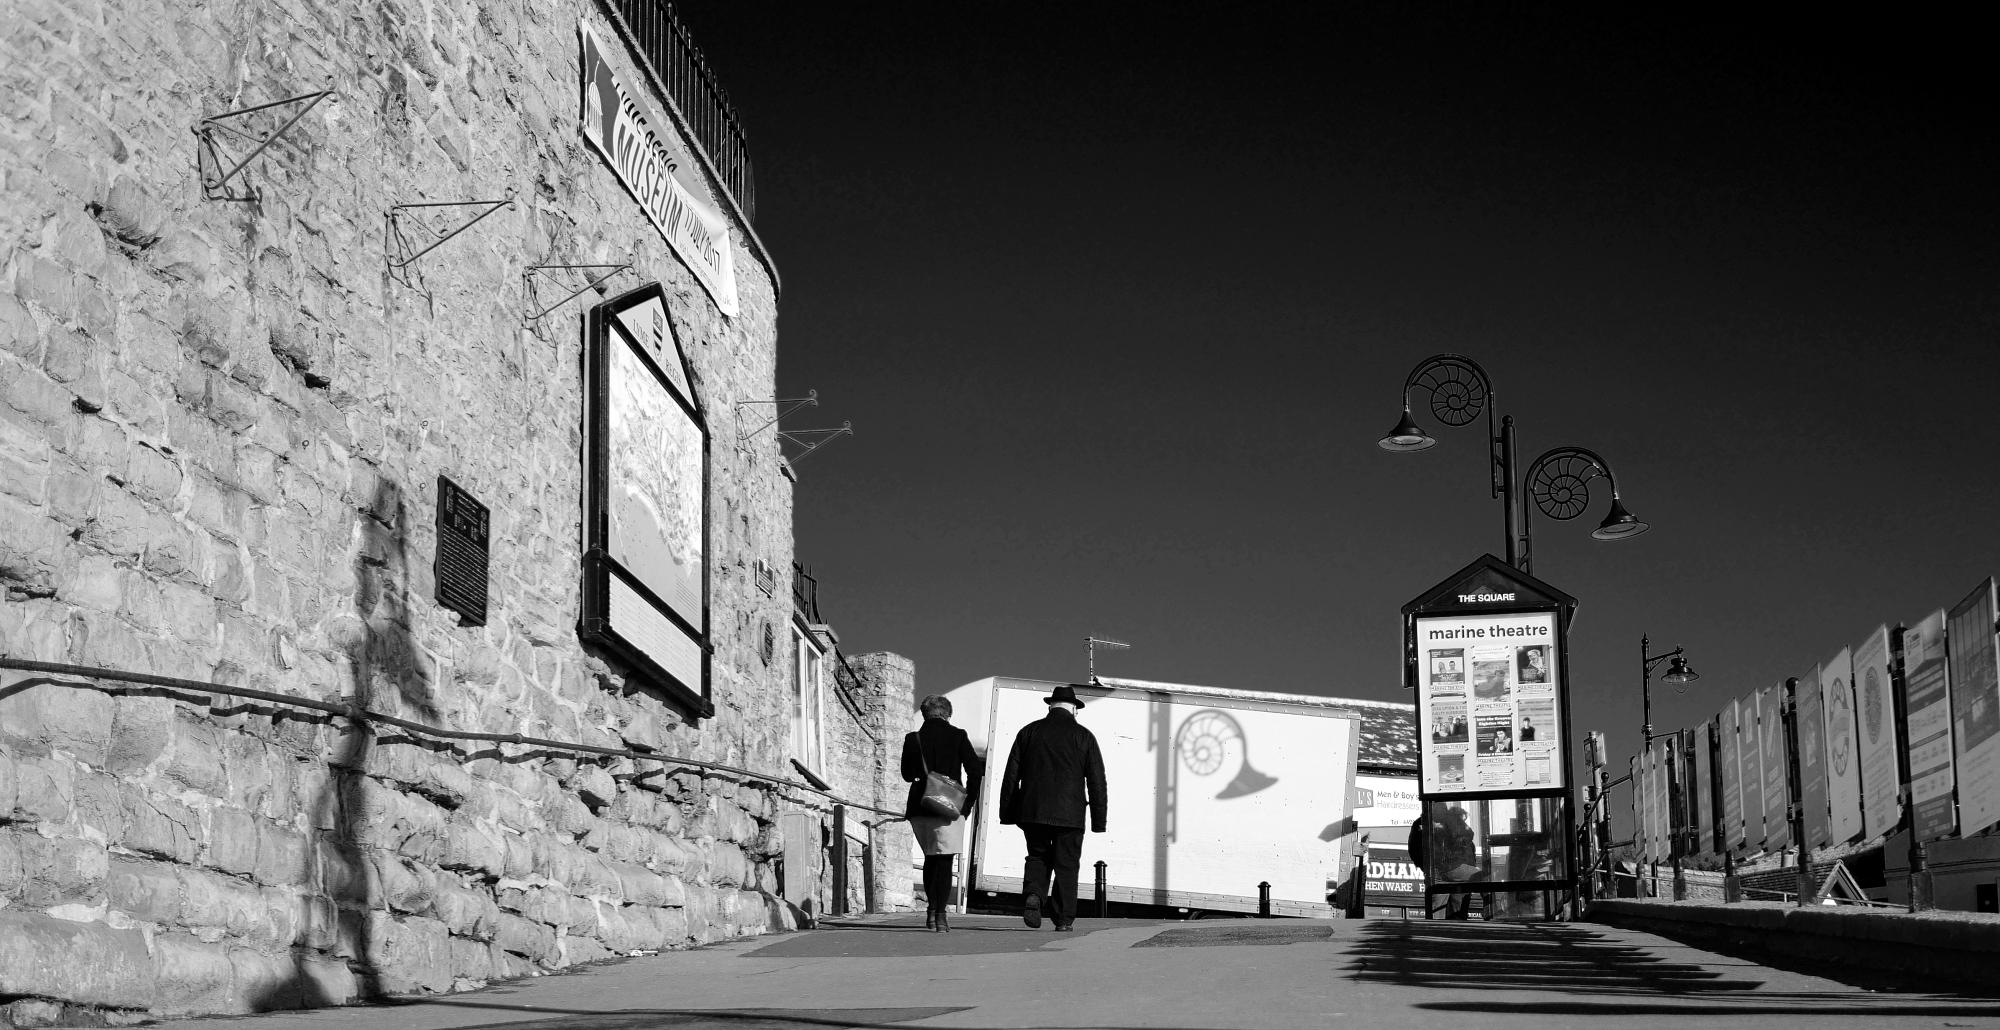 Cobb Gate, Lyme Regis